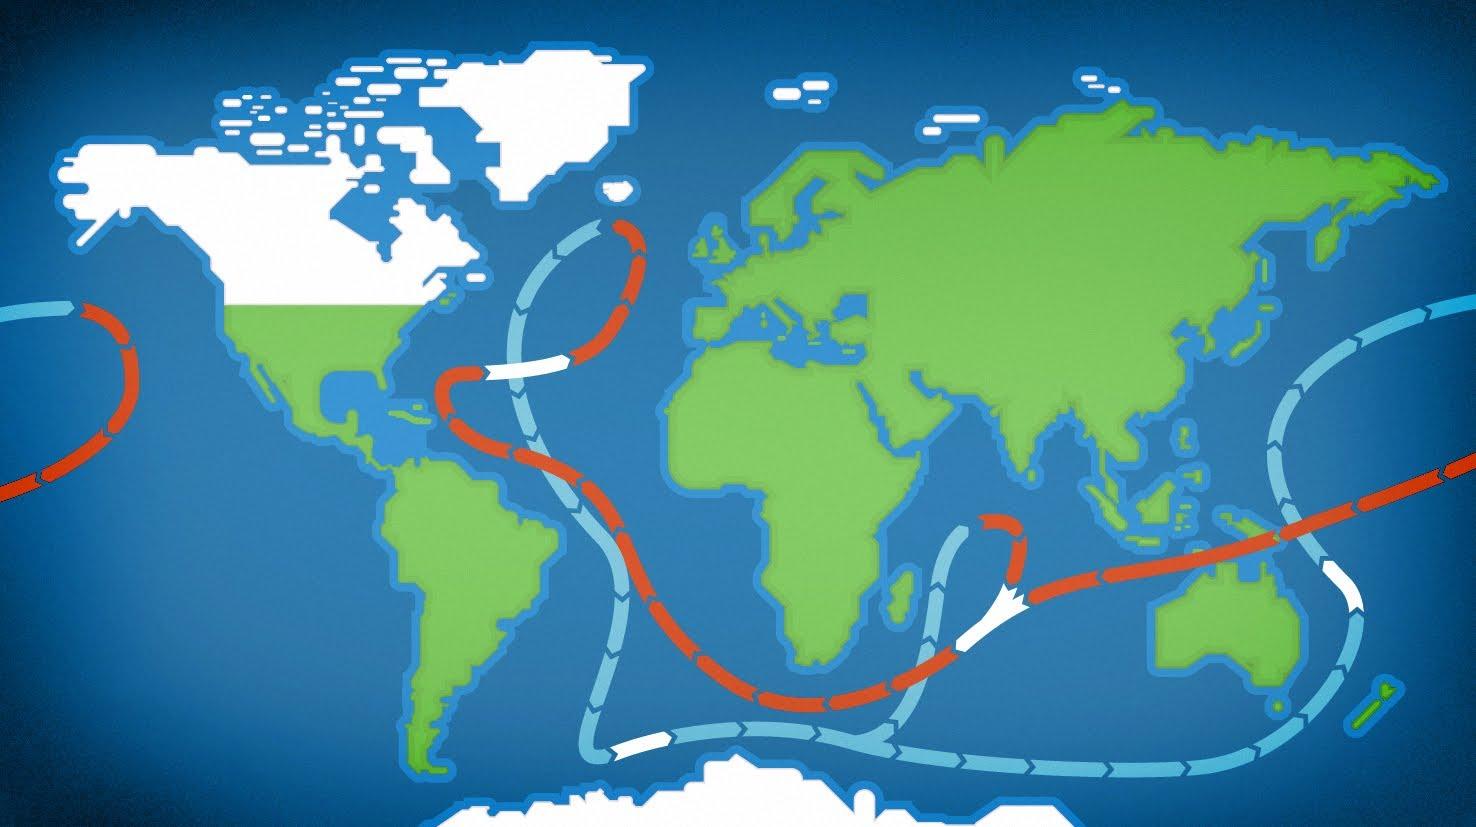 [Kurzgesagt – In a Nutshell] Giải Thích Về Dòng Vịnh -- The Gulf Stream Explained